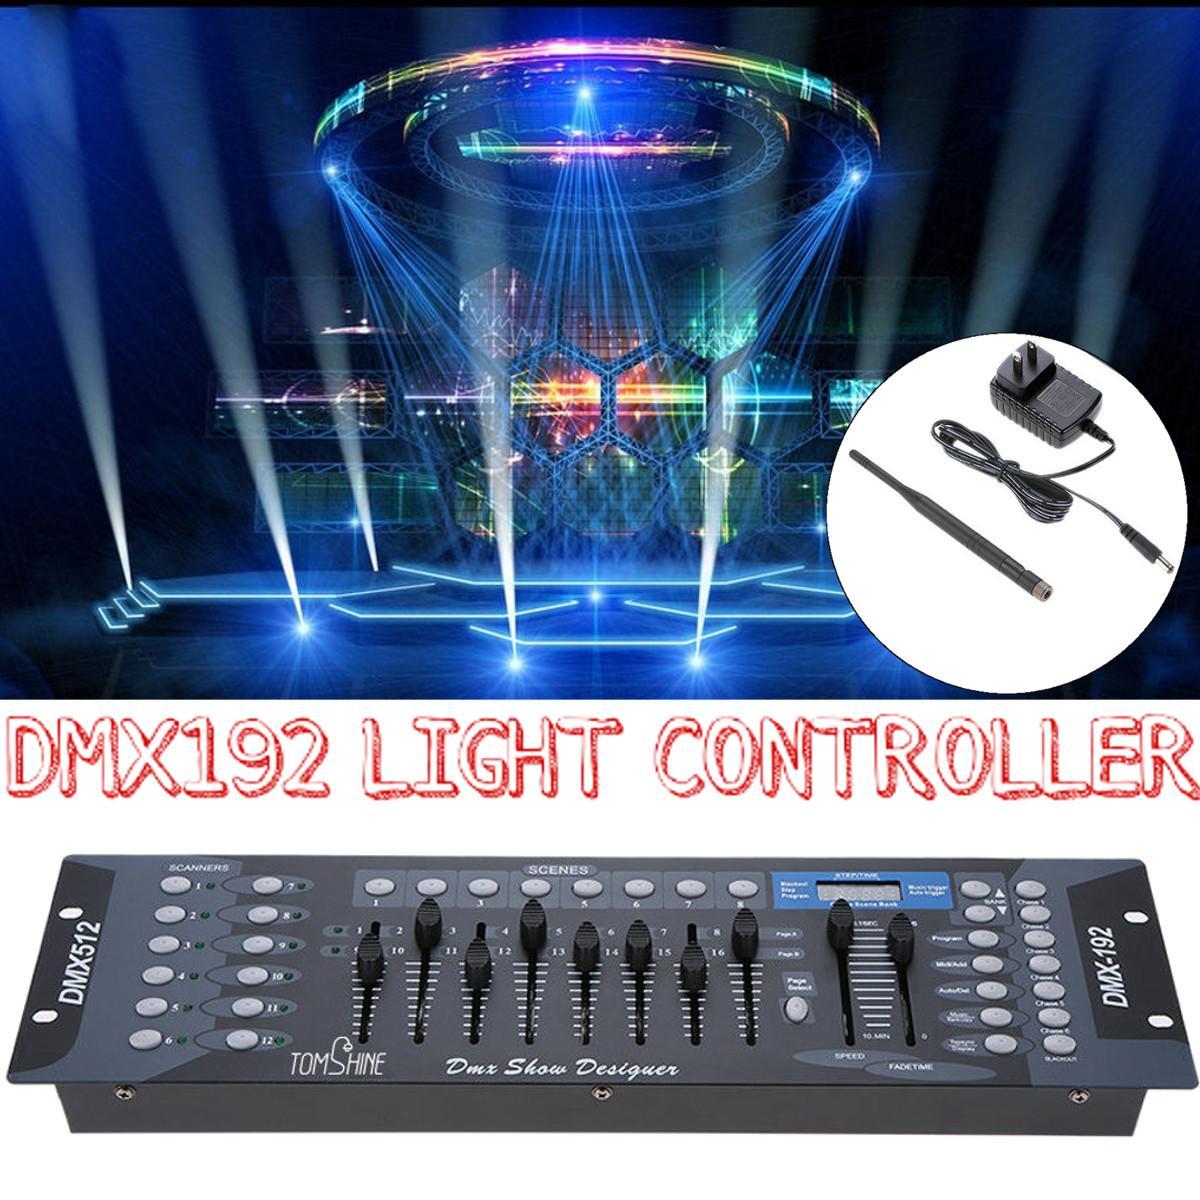 2pcs/lots International standard DMX 192 controller